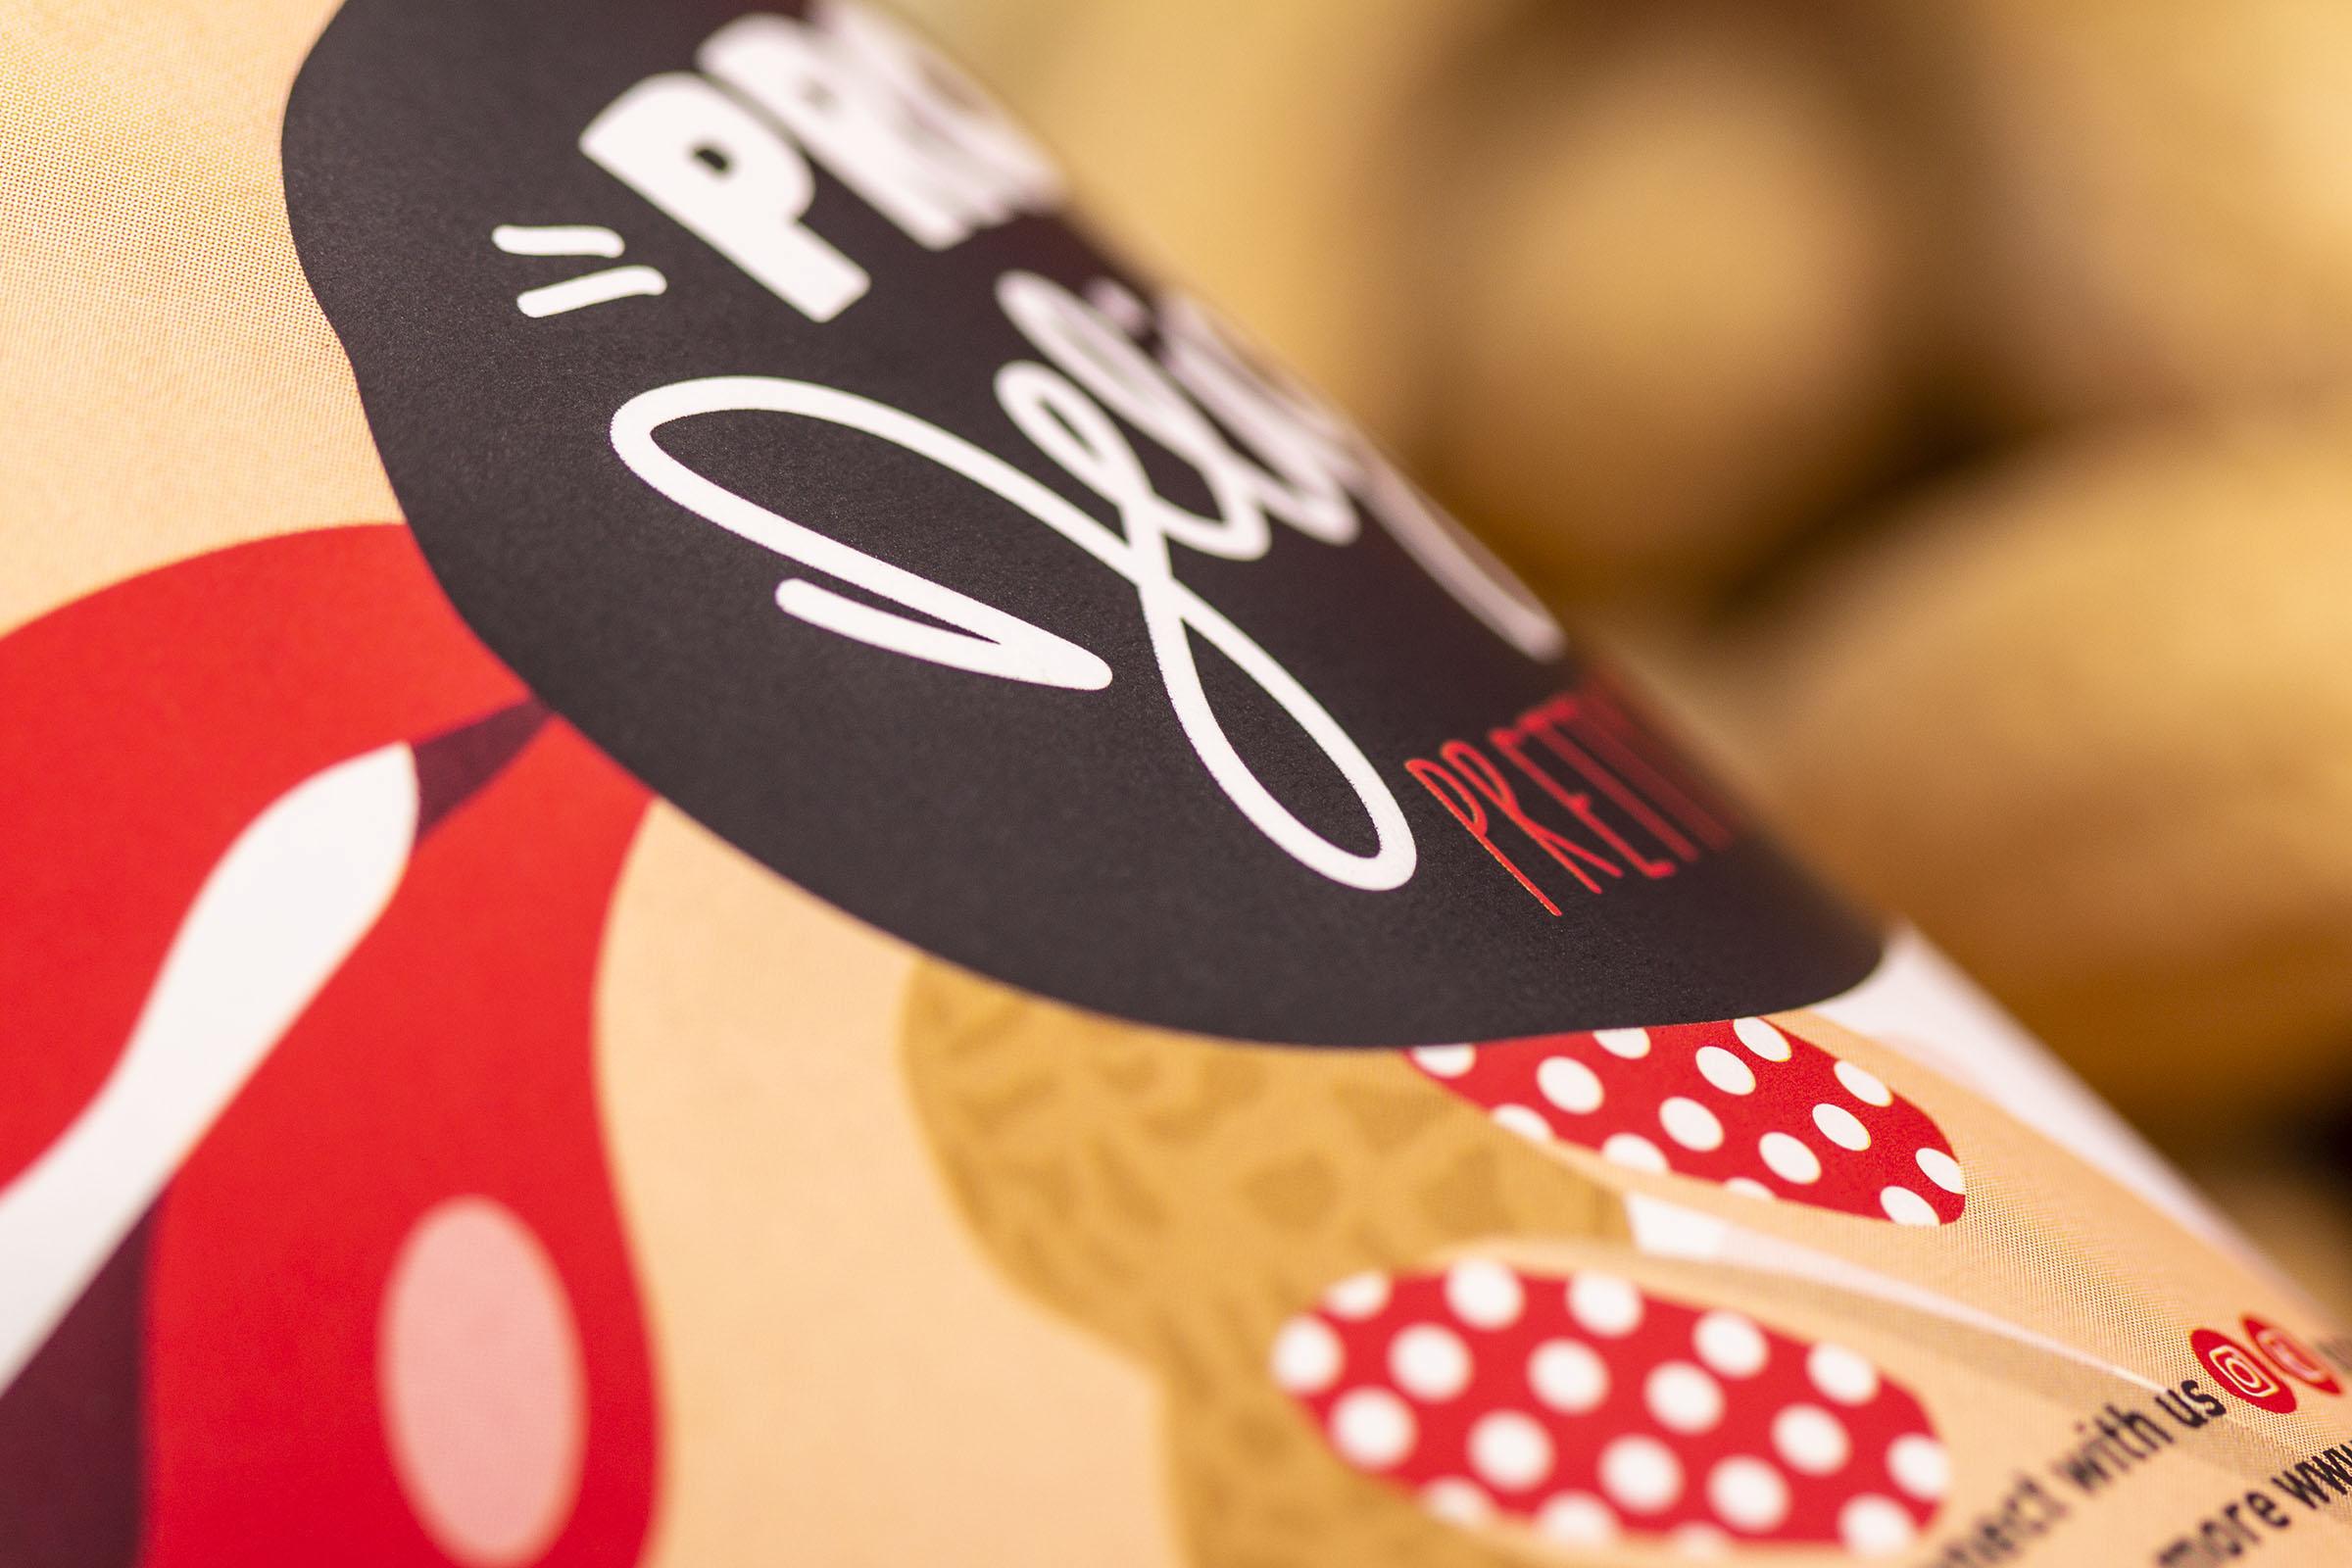 Pro Delight | 果汁咖啡杯子设计插图(5)